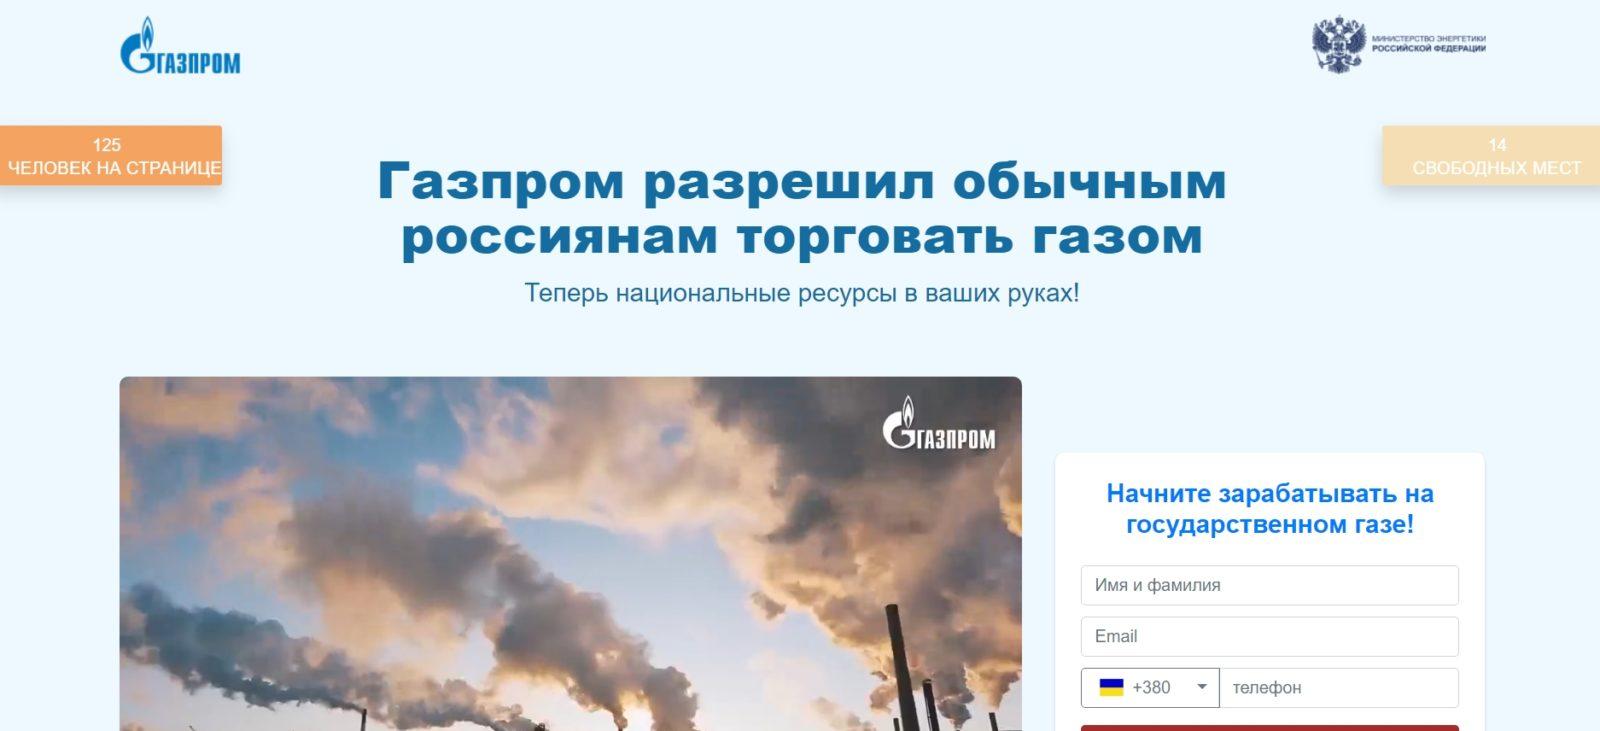 Сайт компании Газпром Инвестиции